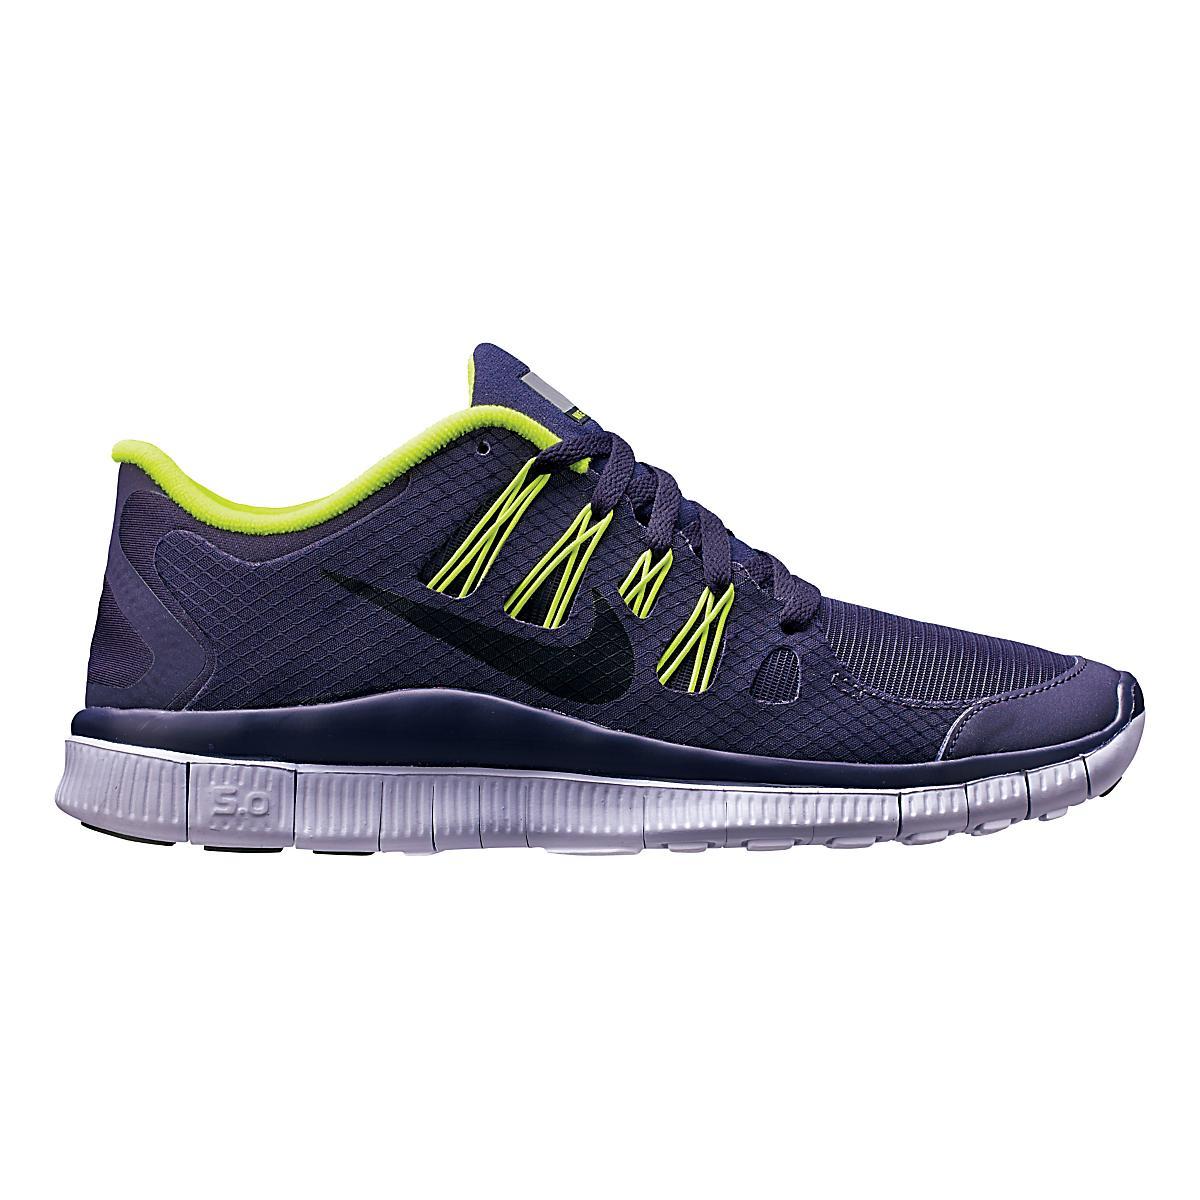 Womens Nike Free 5.0+ Shield Running Shoe at Road Runner